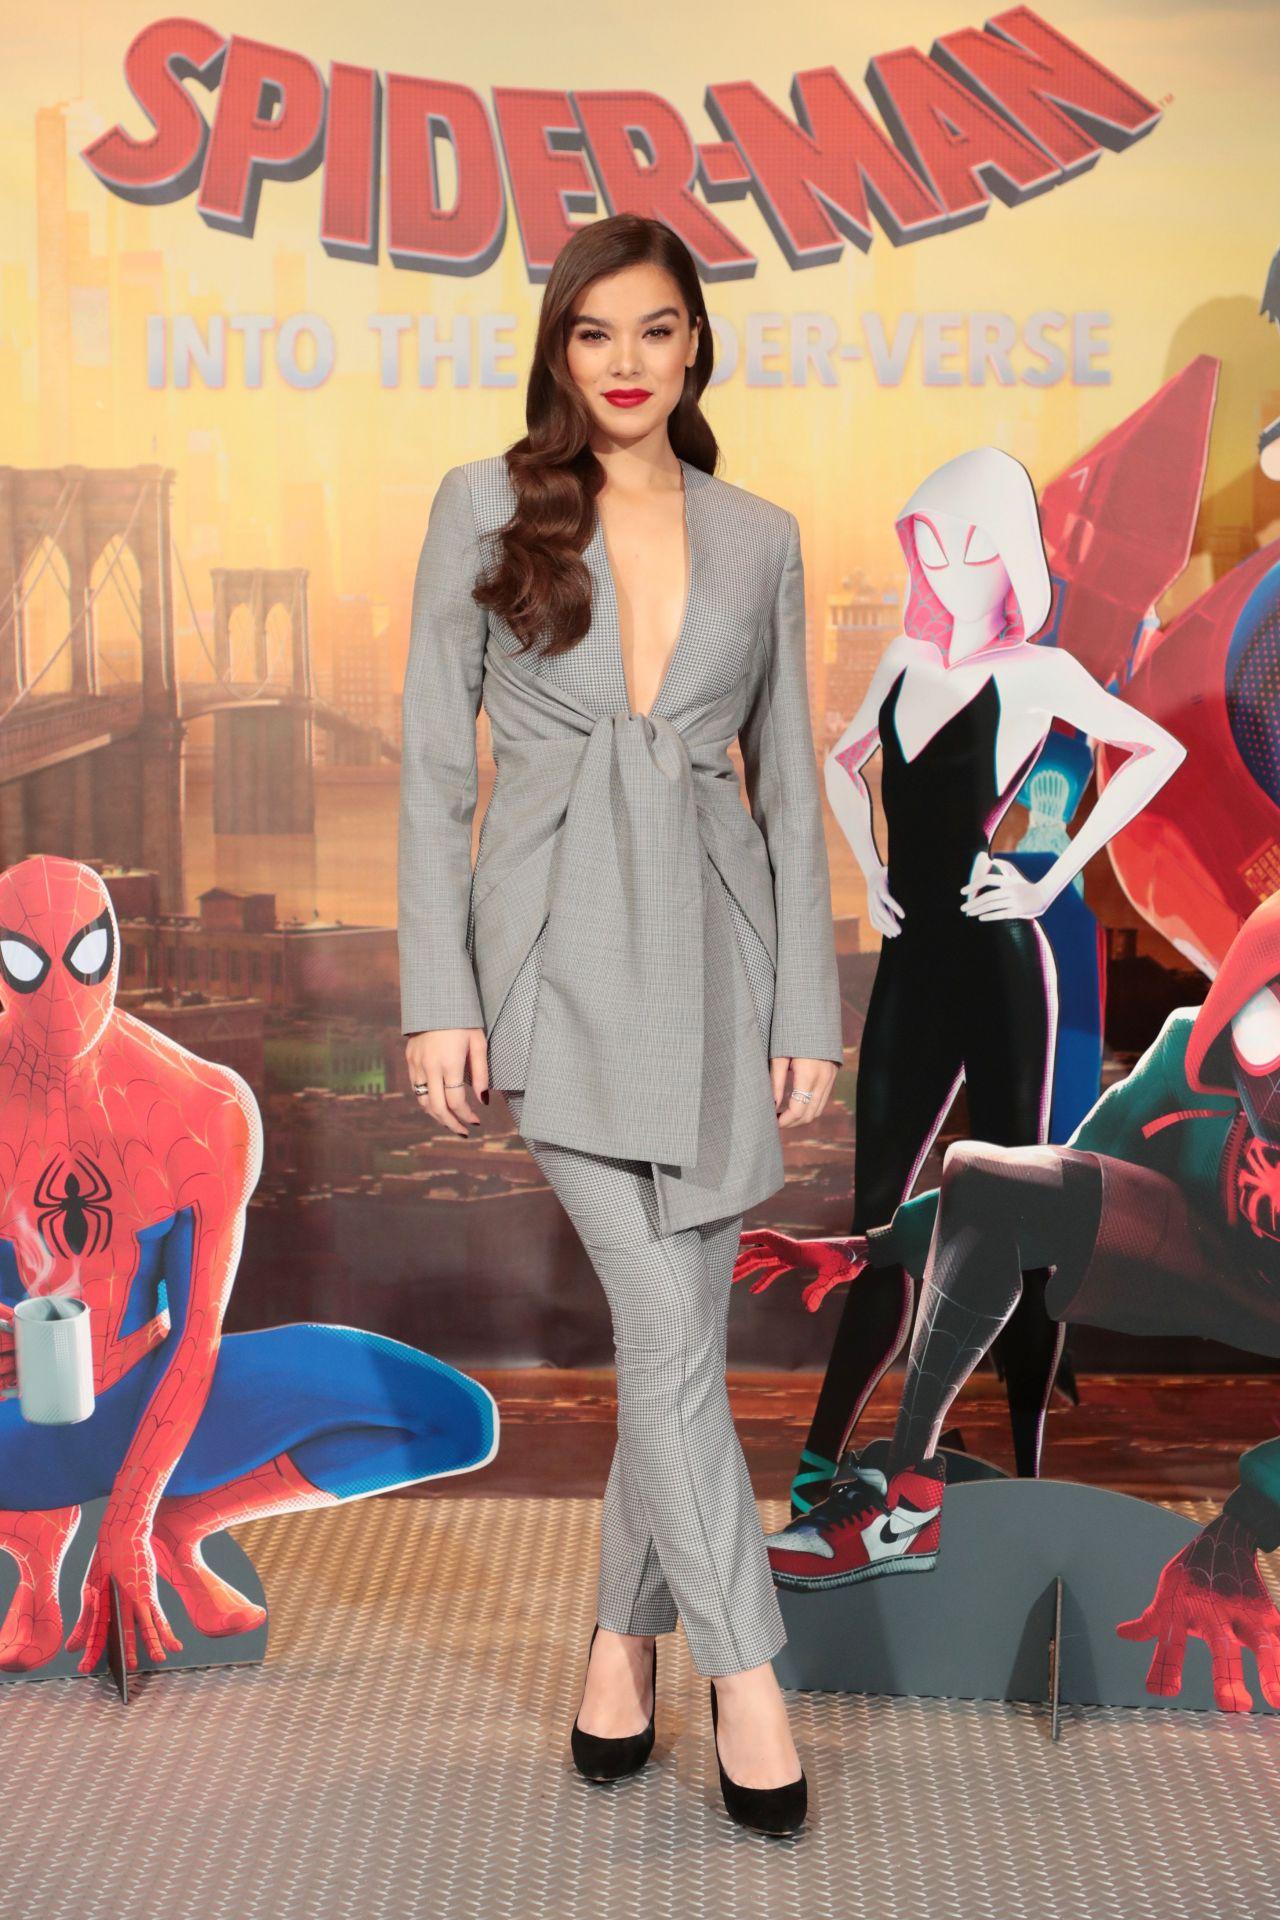 https://celebmafia.com/wp-content/uploads/2018/12/hailee-steinfeld-spider-man-into-the-spiderverse-photocall-in-la-9.jpg